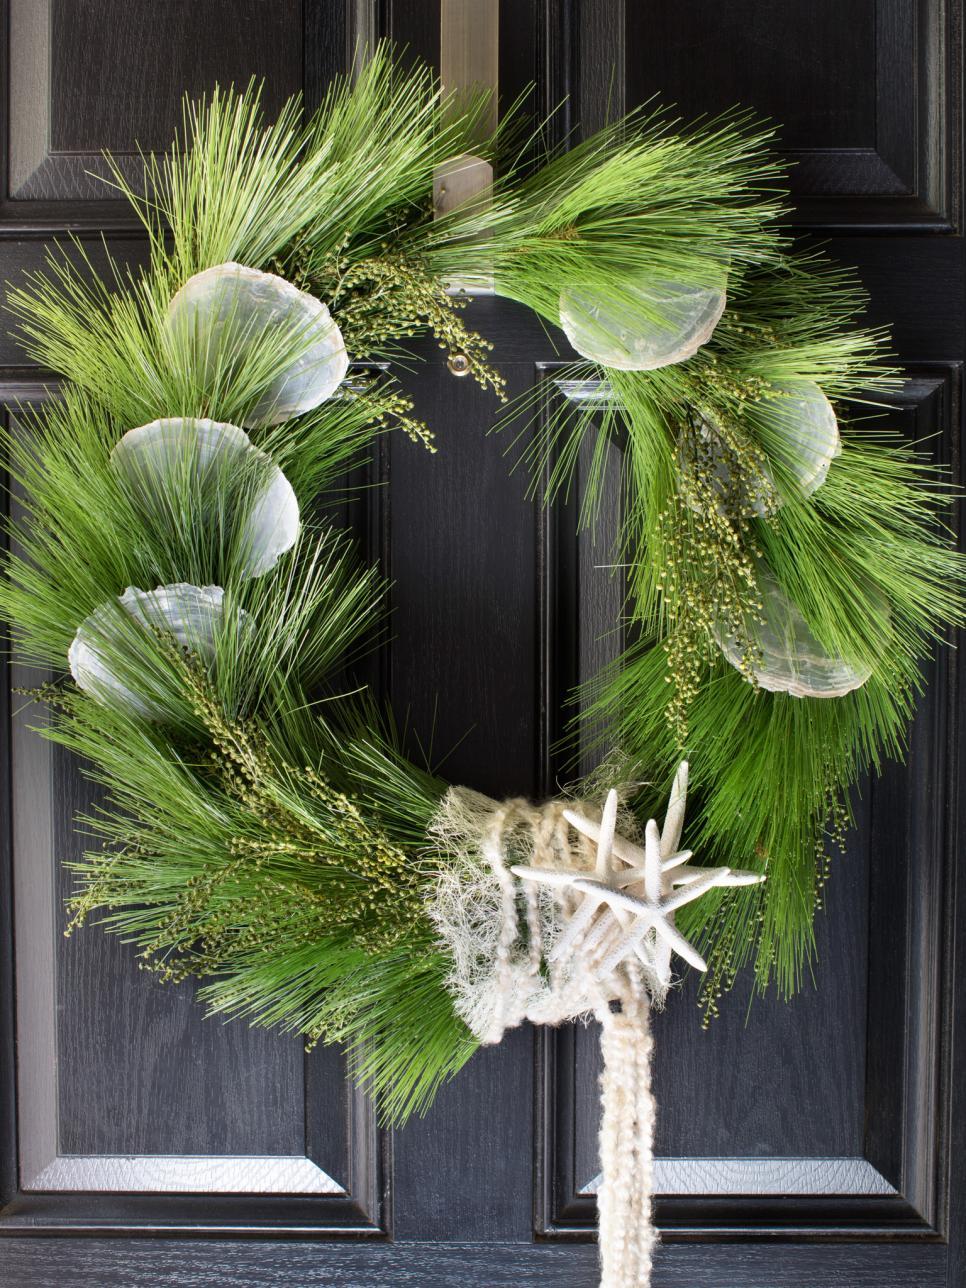 Coastal Christmas Decorations | HGTV